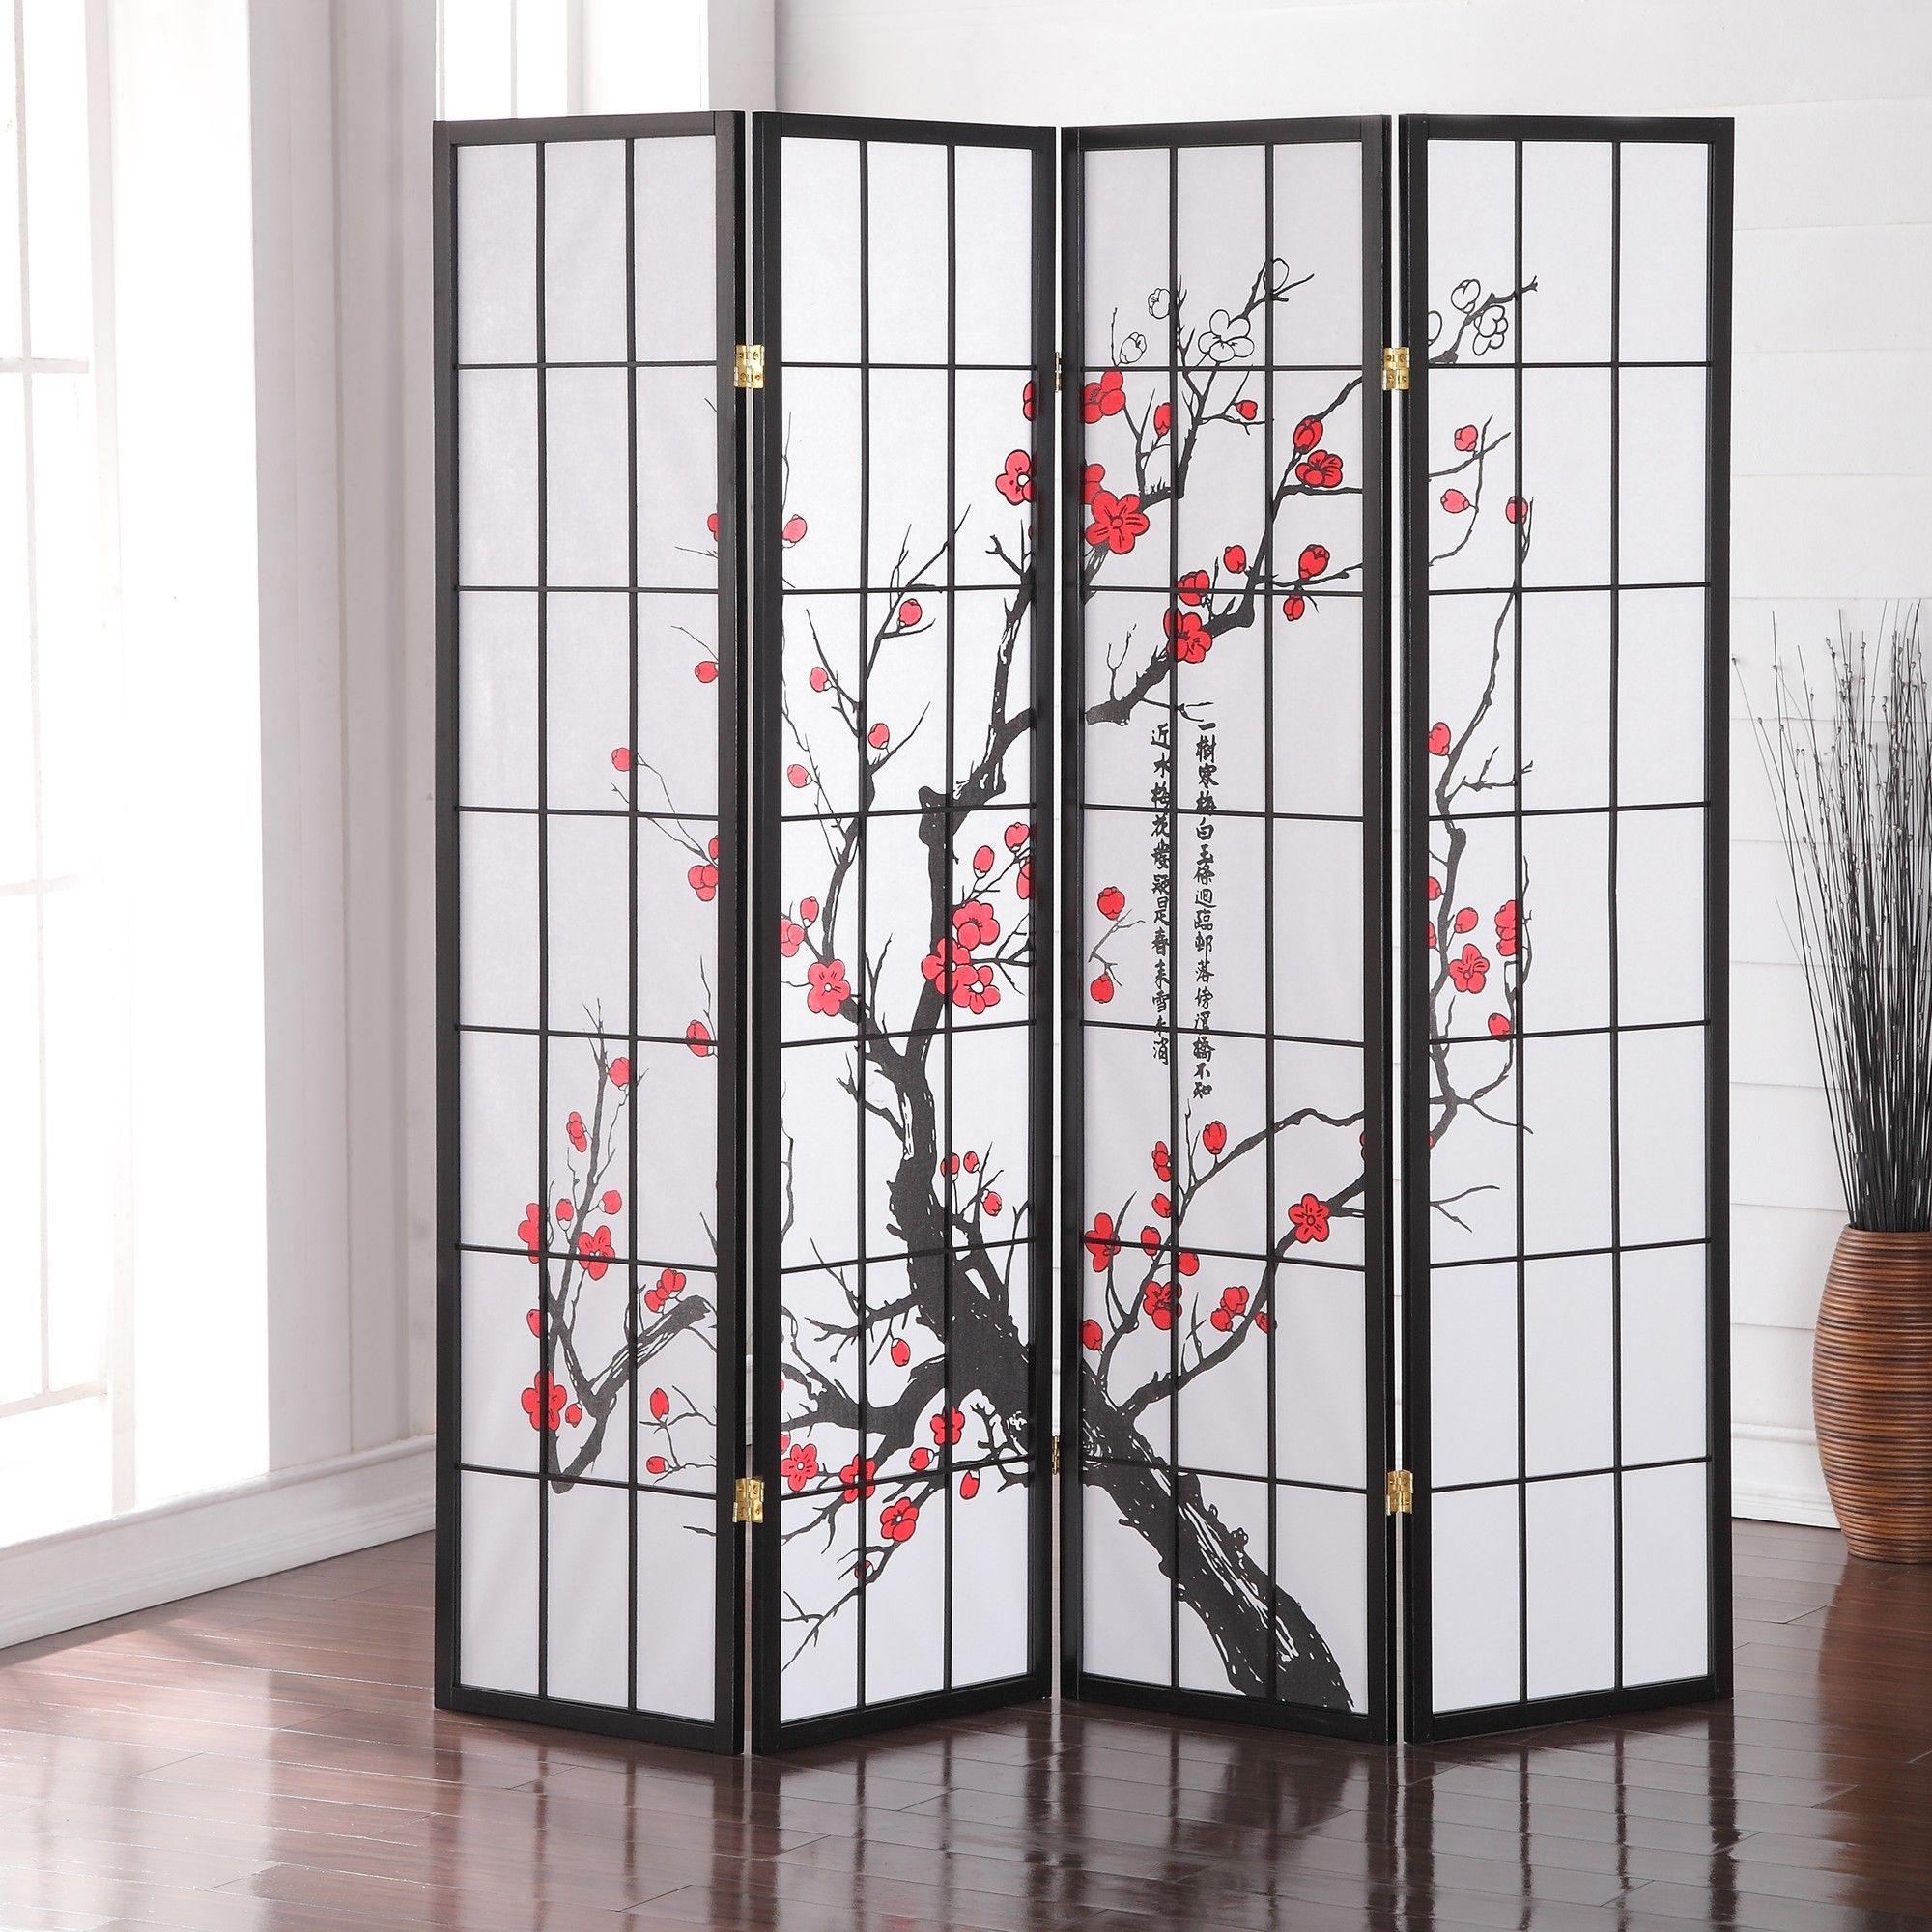 Roundhill Furniture 71 X 72 Japanese Plum Blossom 4 Panel Room Divider Room Divider Screen Wooden Room Dividers Japanese Room Decor